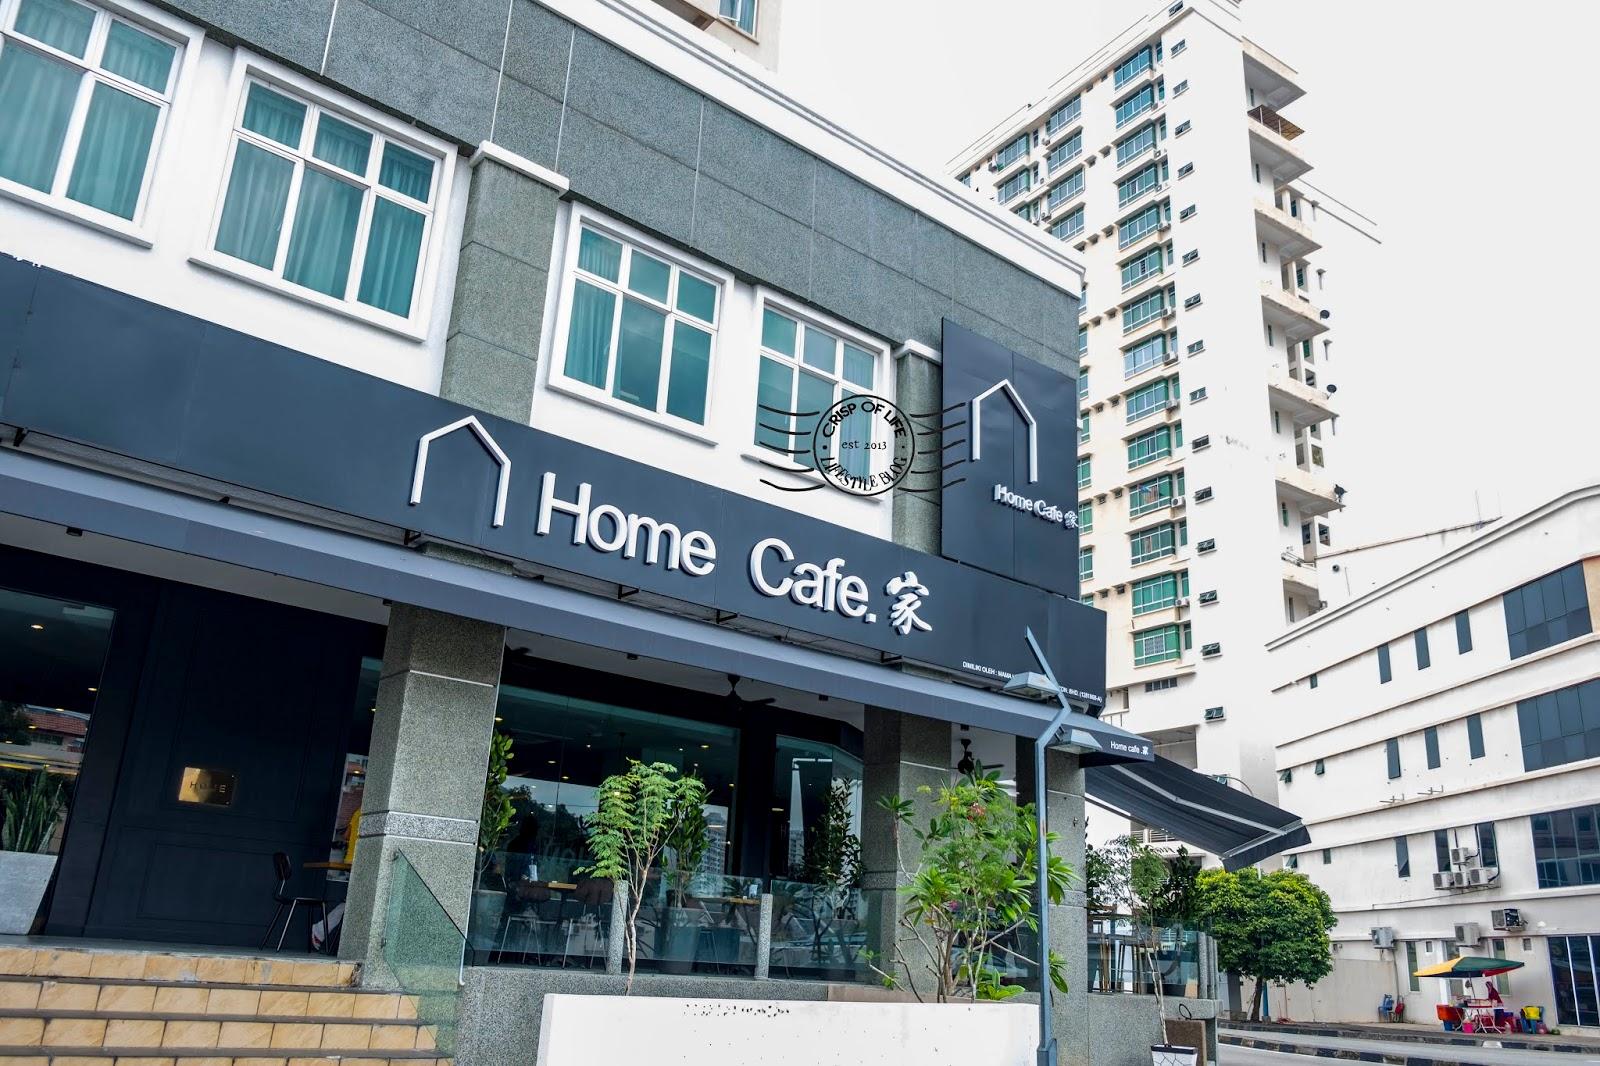 Home Cafe @ Alora Hotel, Penang